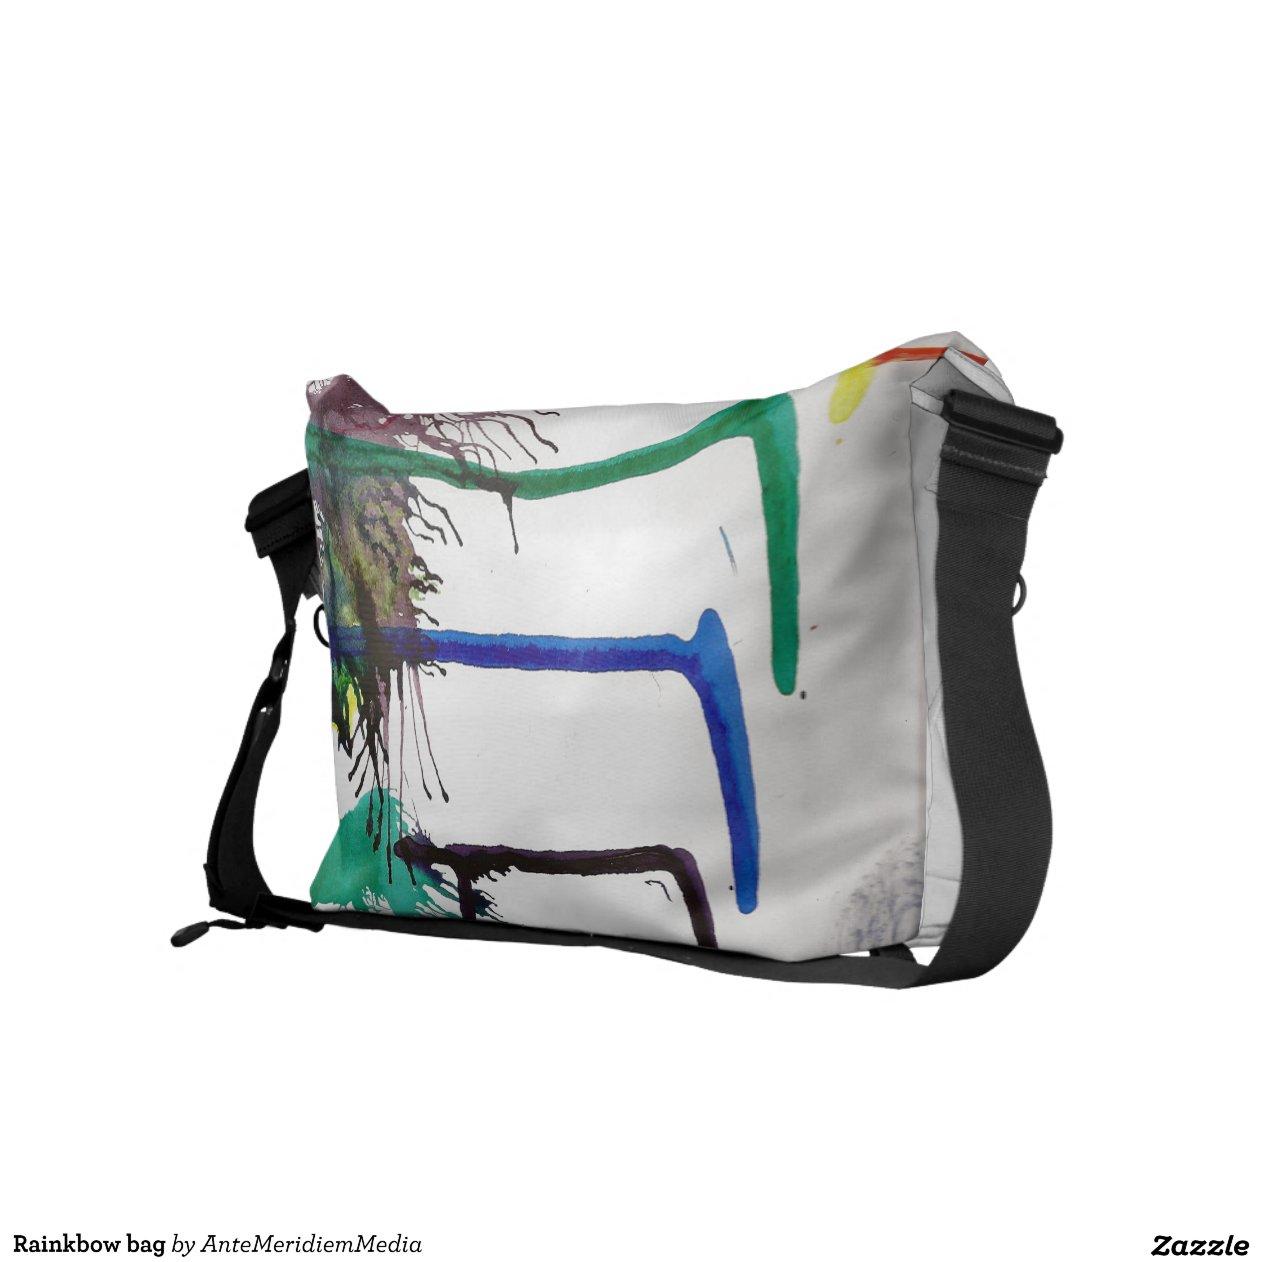 Kawaii Bow Bag Rainkbow Bag Messenger Bags Rcfafcefeeadbe In Byvr